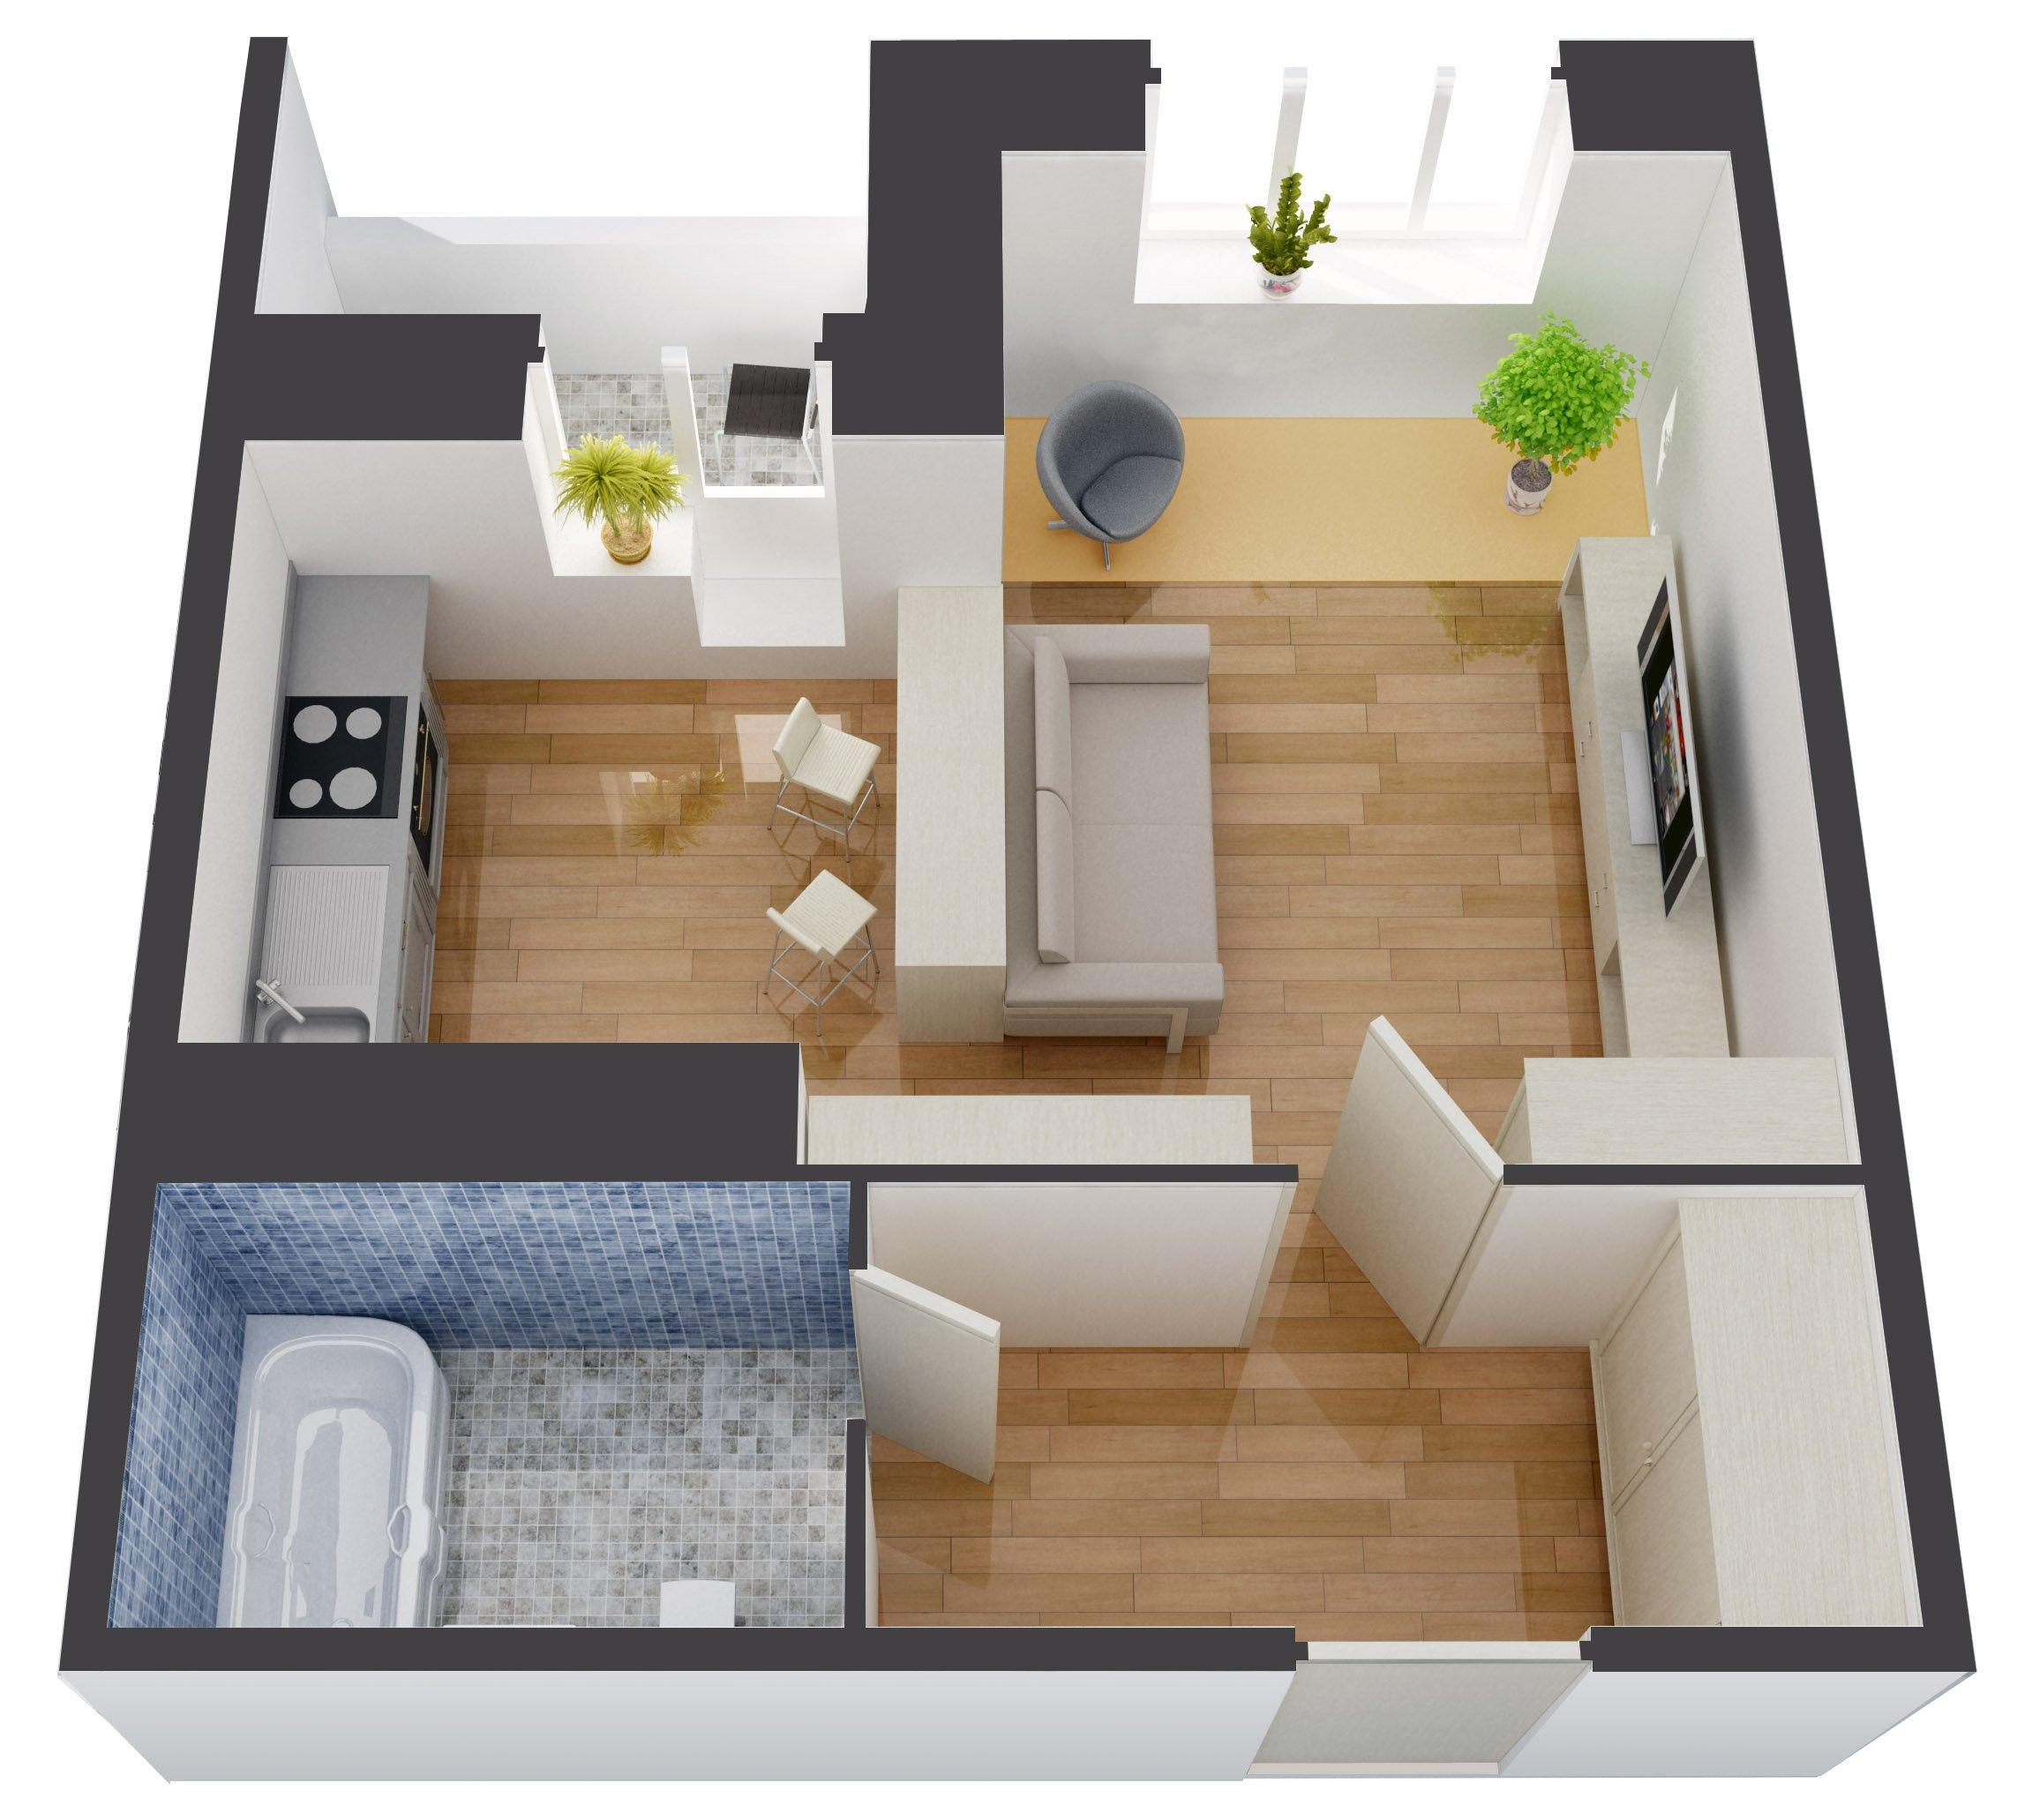 Проект однокомнатной квартиры фото